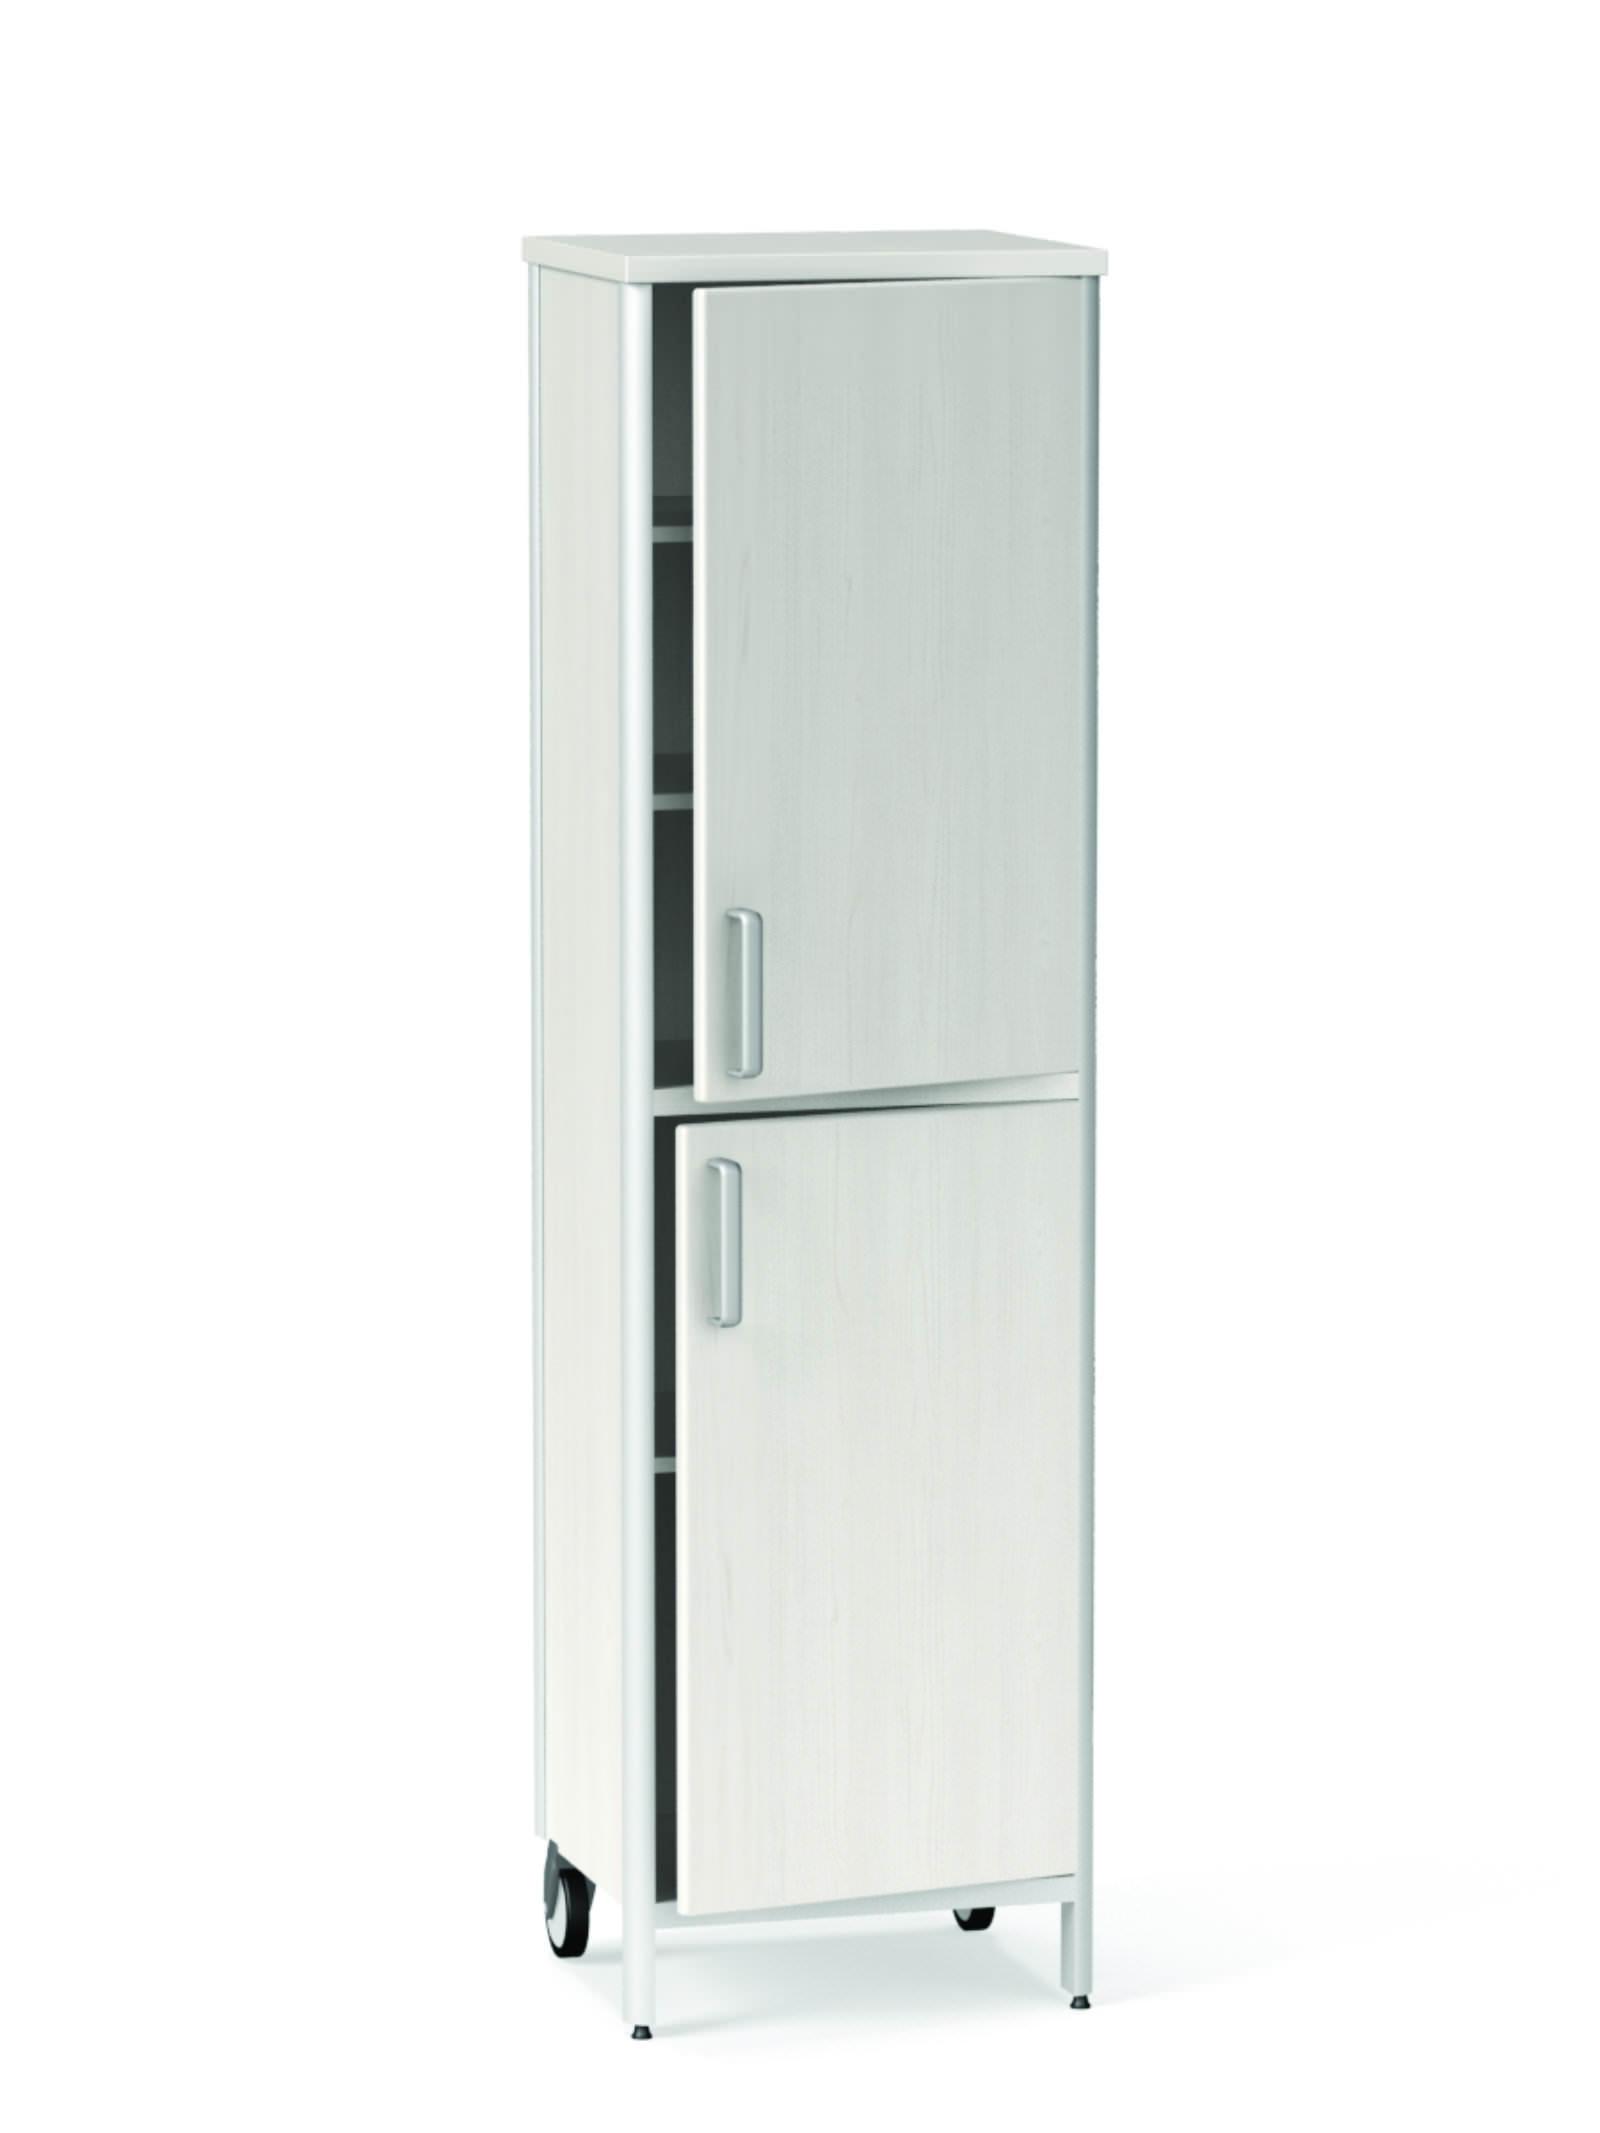 Медицинский шкаф ДМ-3-001-04